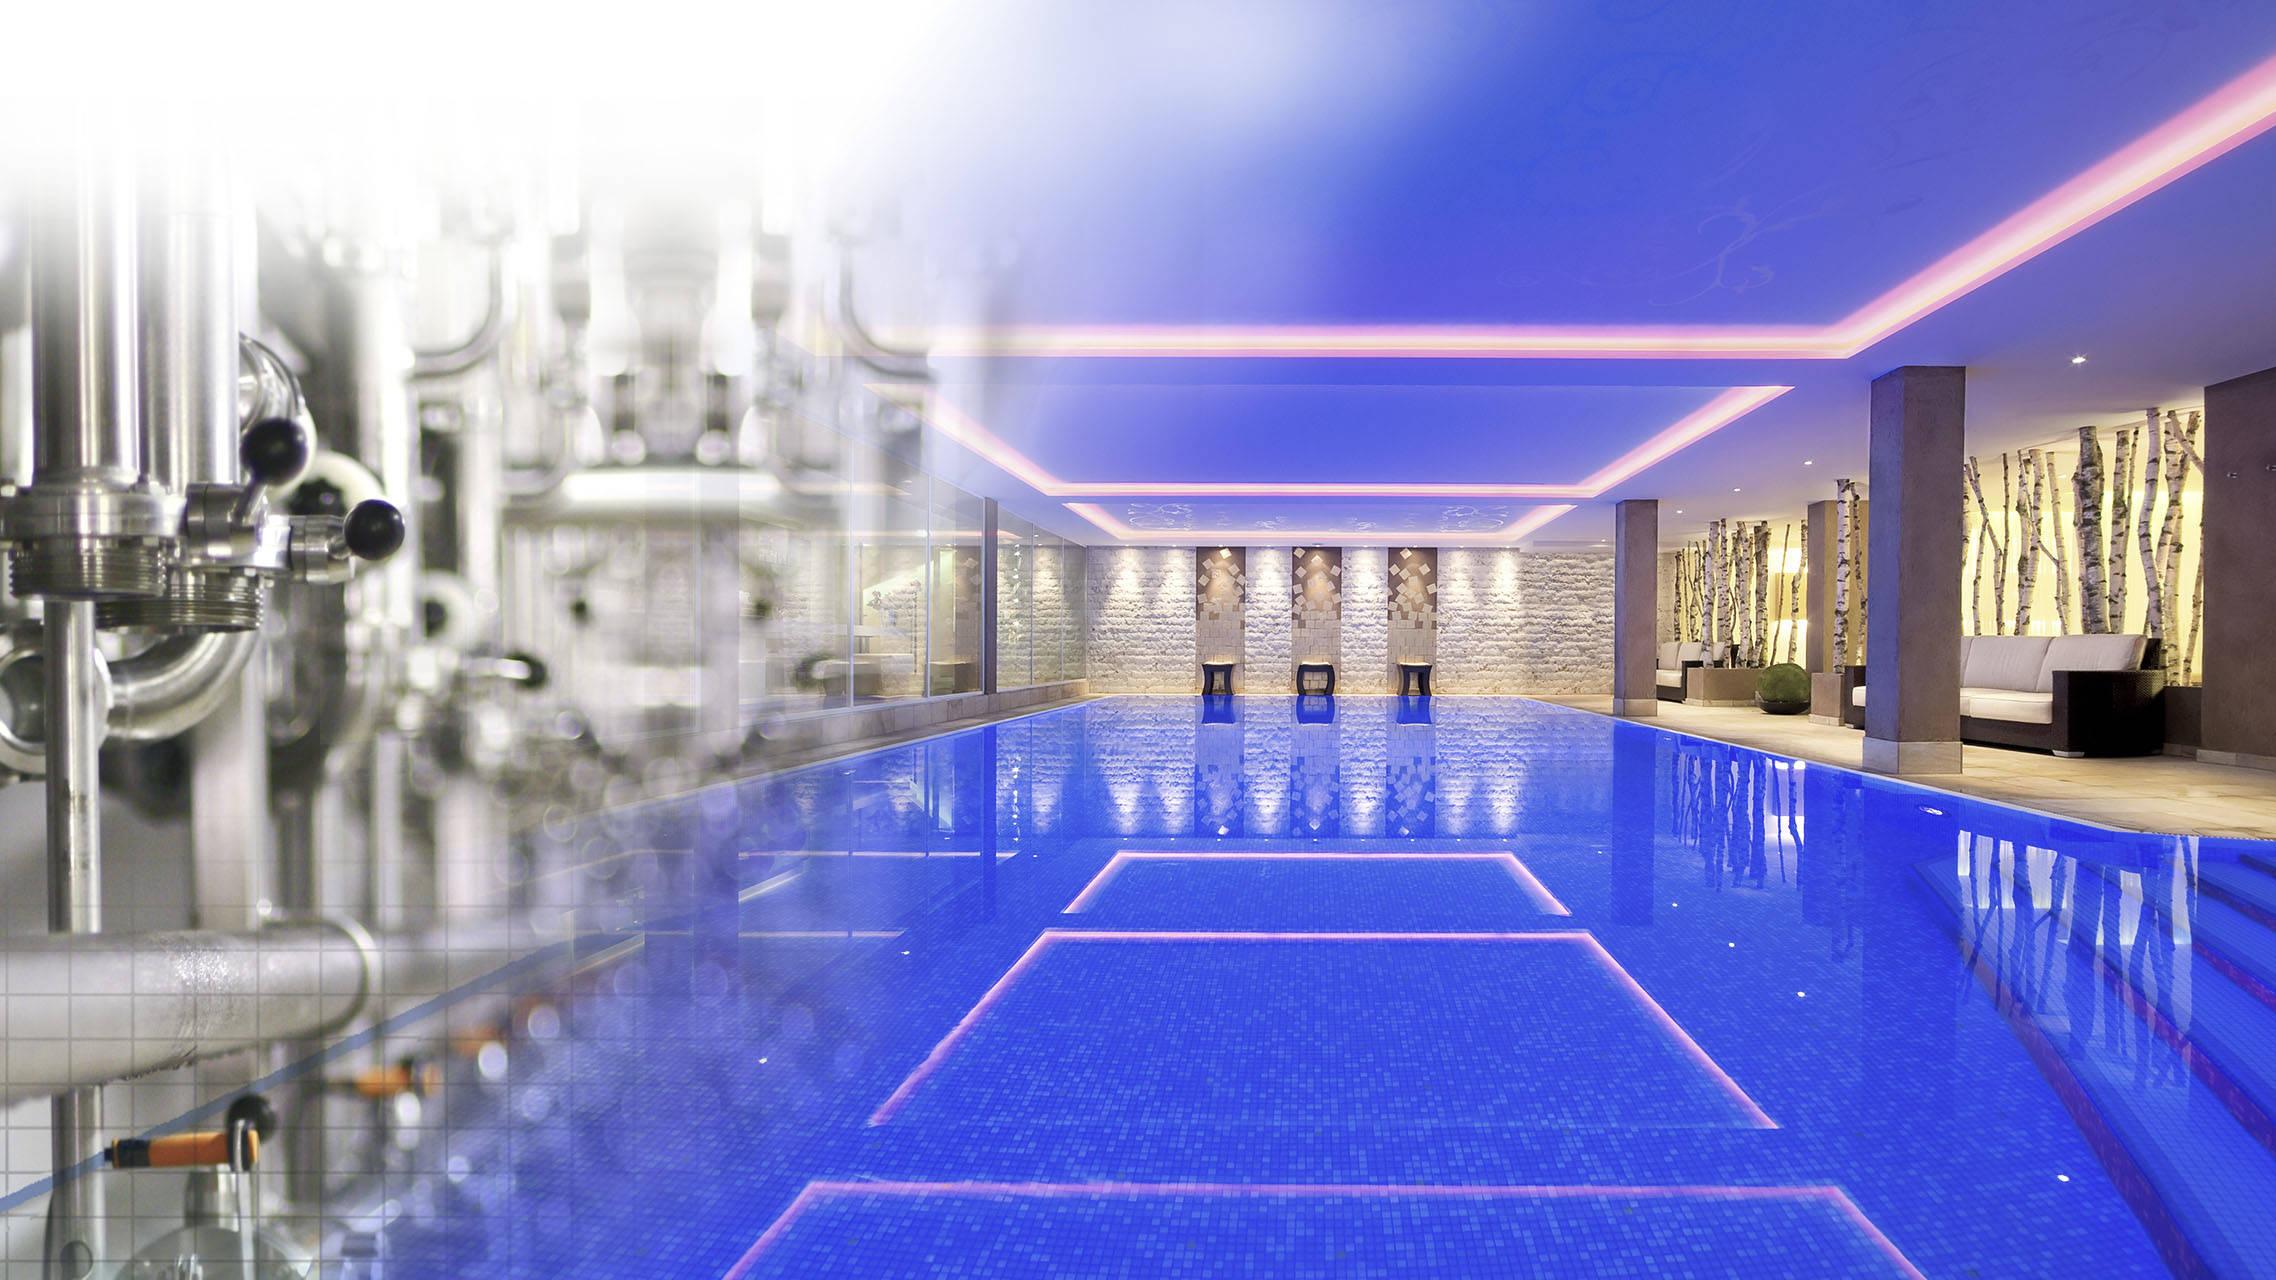 Pool technique